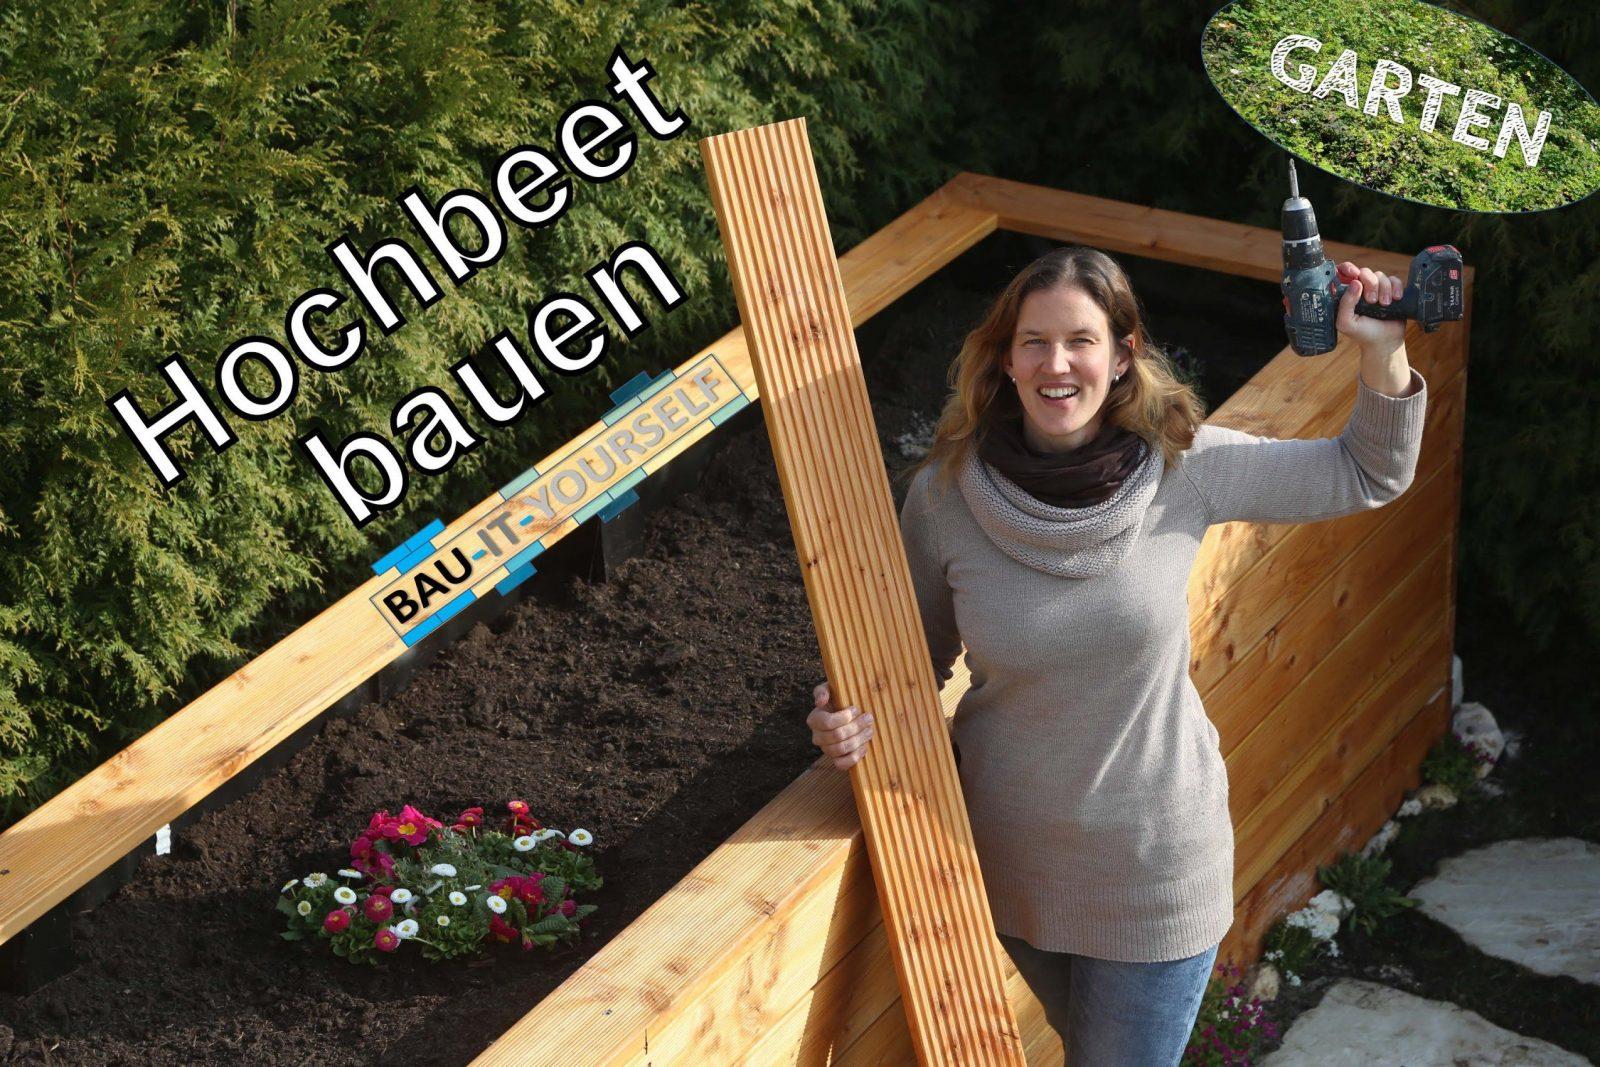 Hochbeet Selber Bauen  Garten Anlegen  Diy Holz Hochbeet von Hochbeet Selber Bauen Youtube Bild